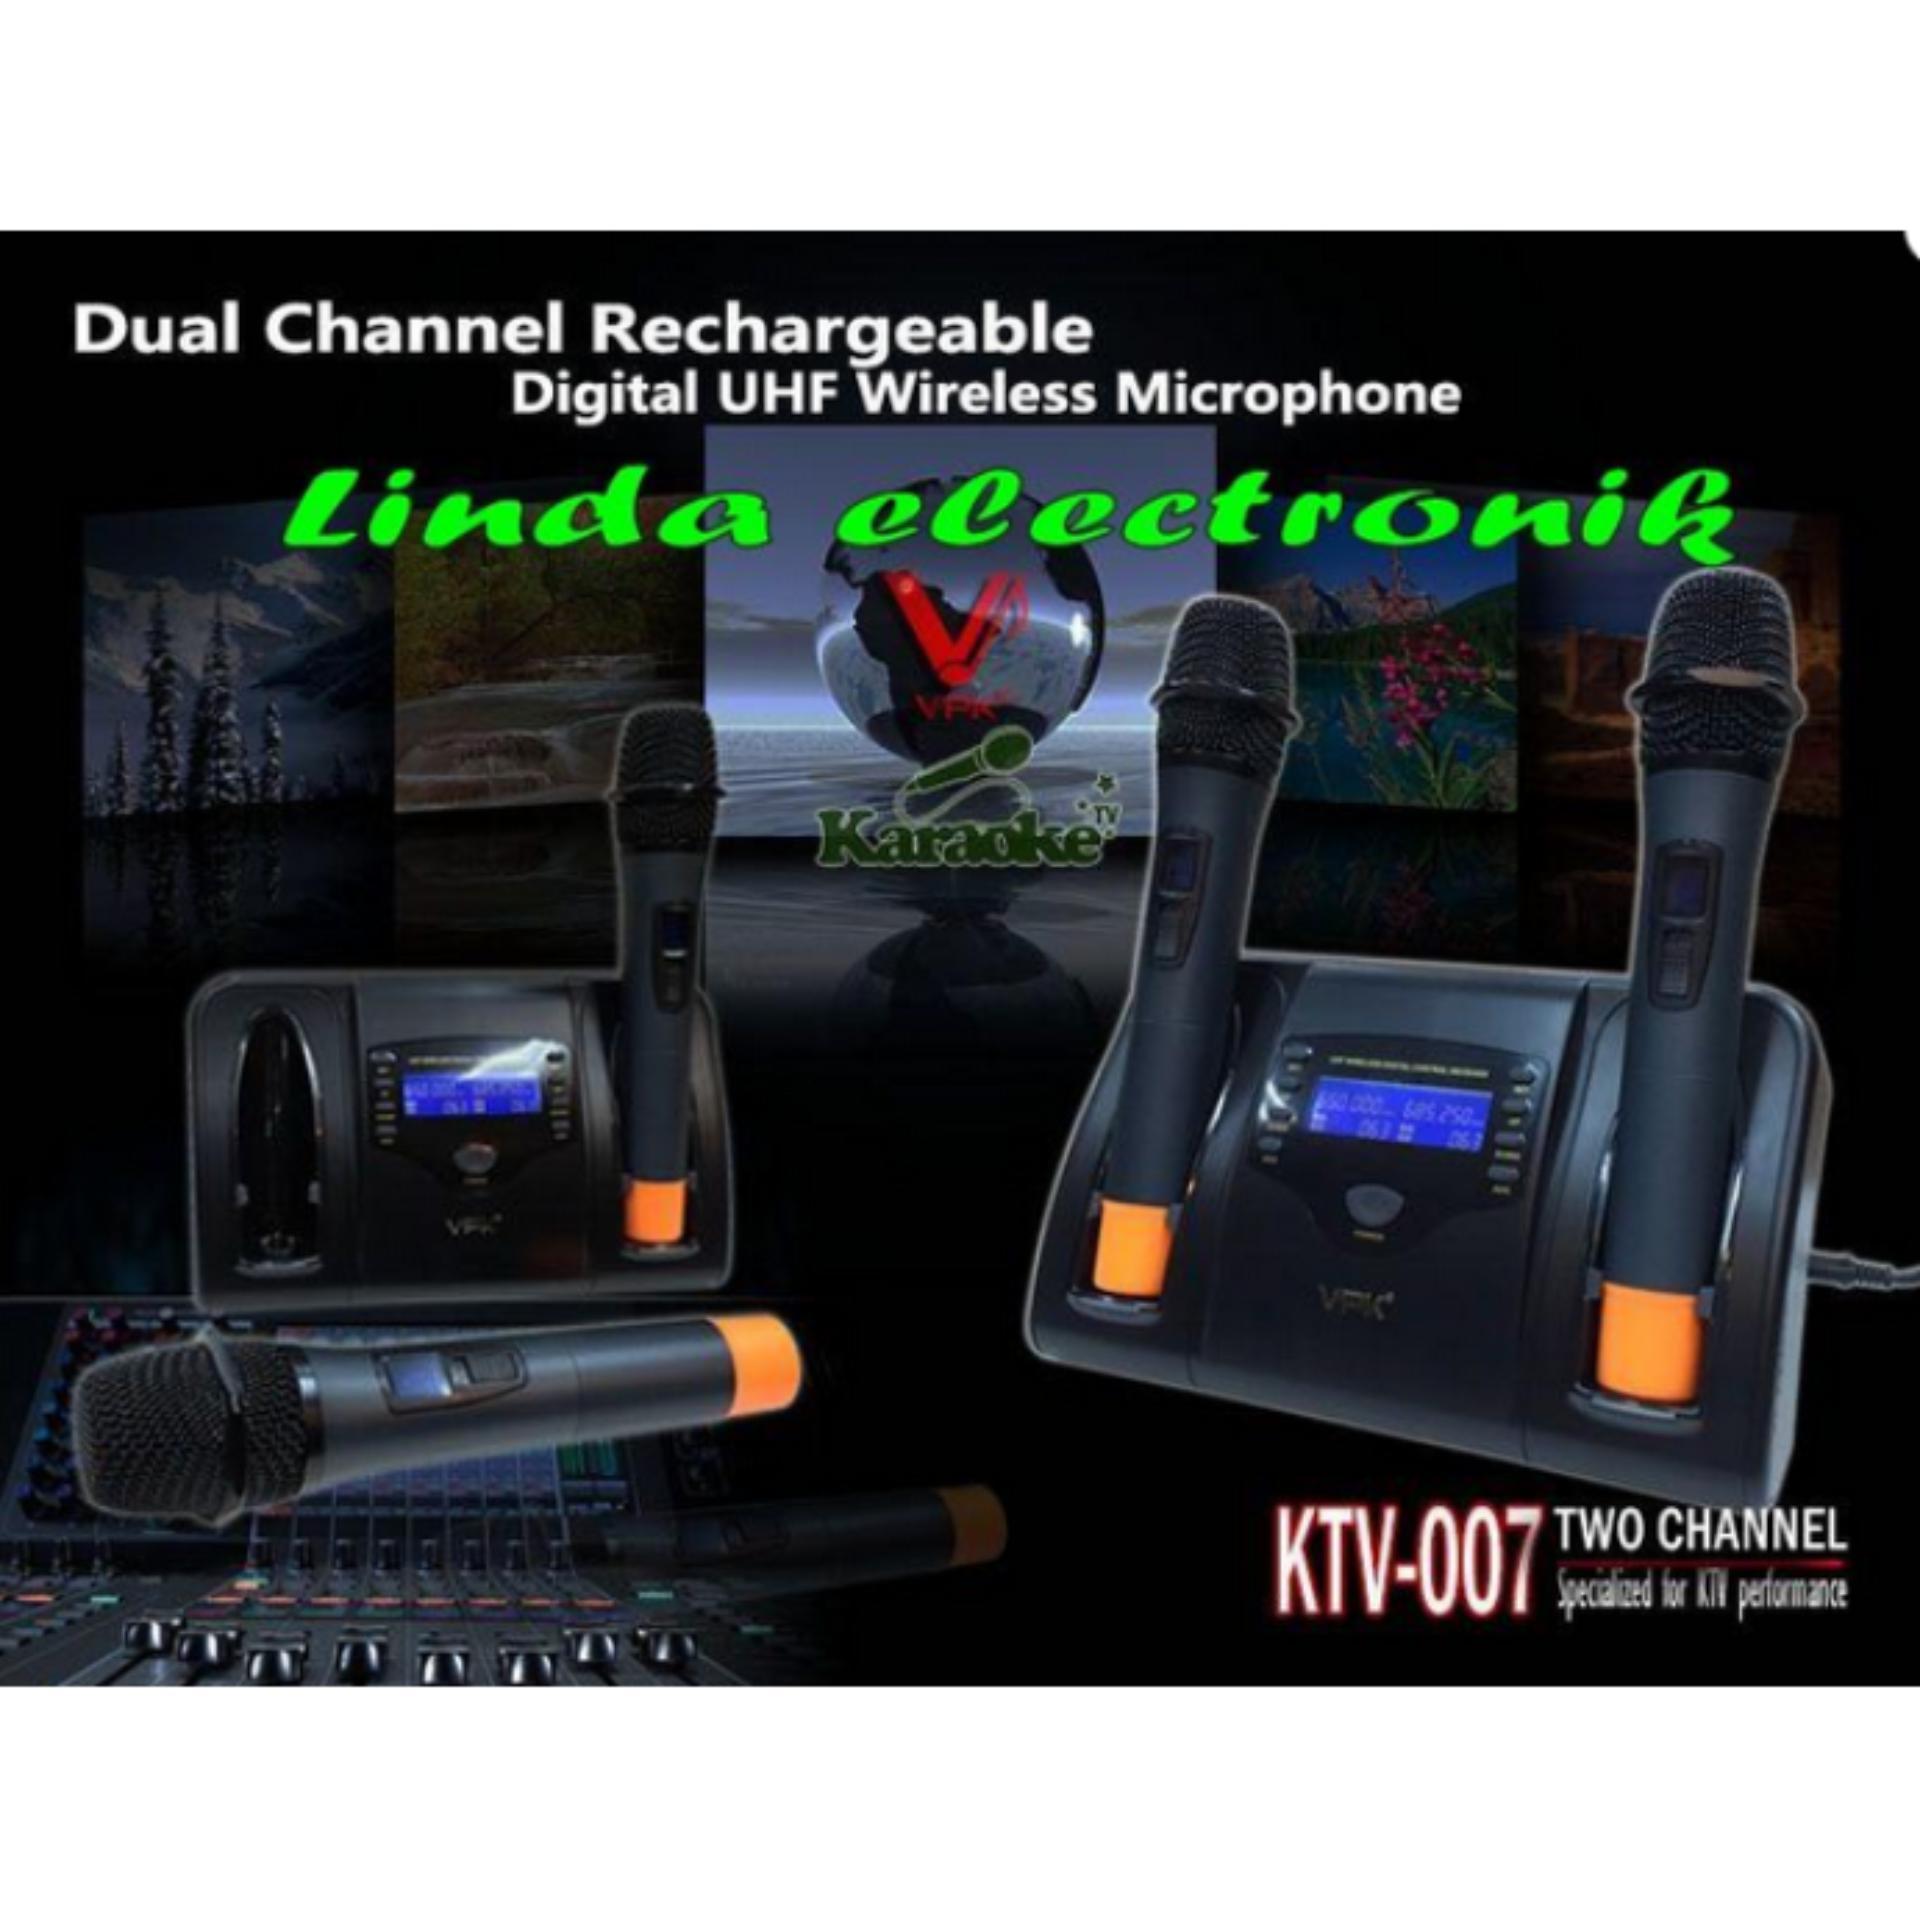 Pencarian Termurah Mic Wireless Vpk Ktv 007 Plus Baterai Charger Phrodi 007p Earphone With Pod